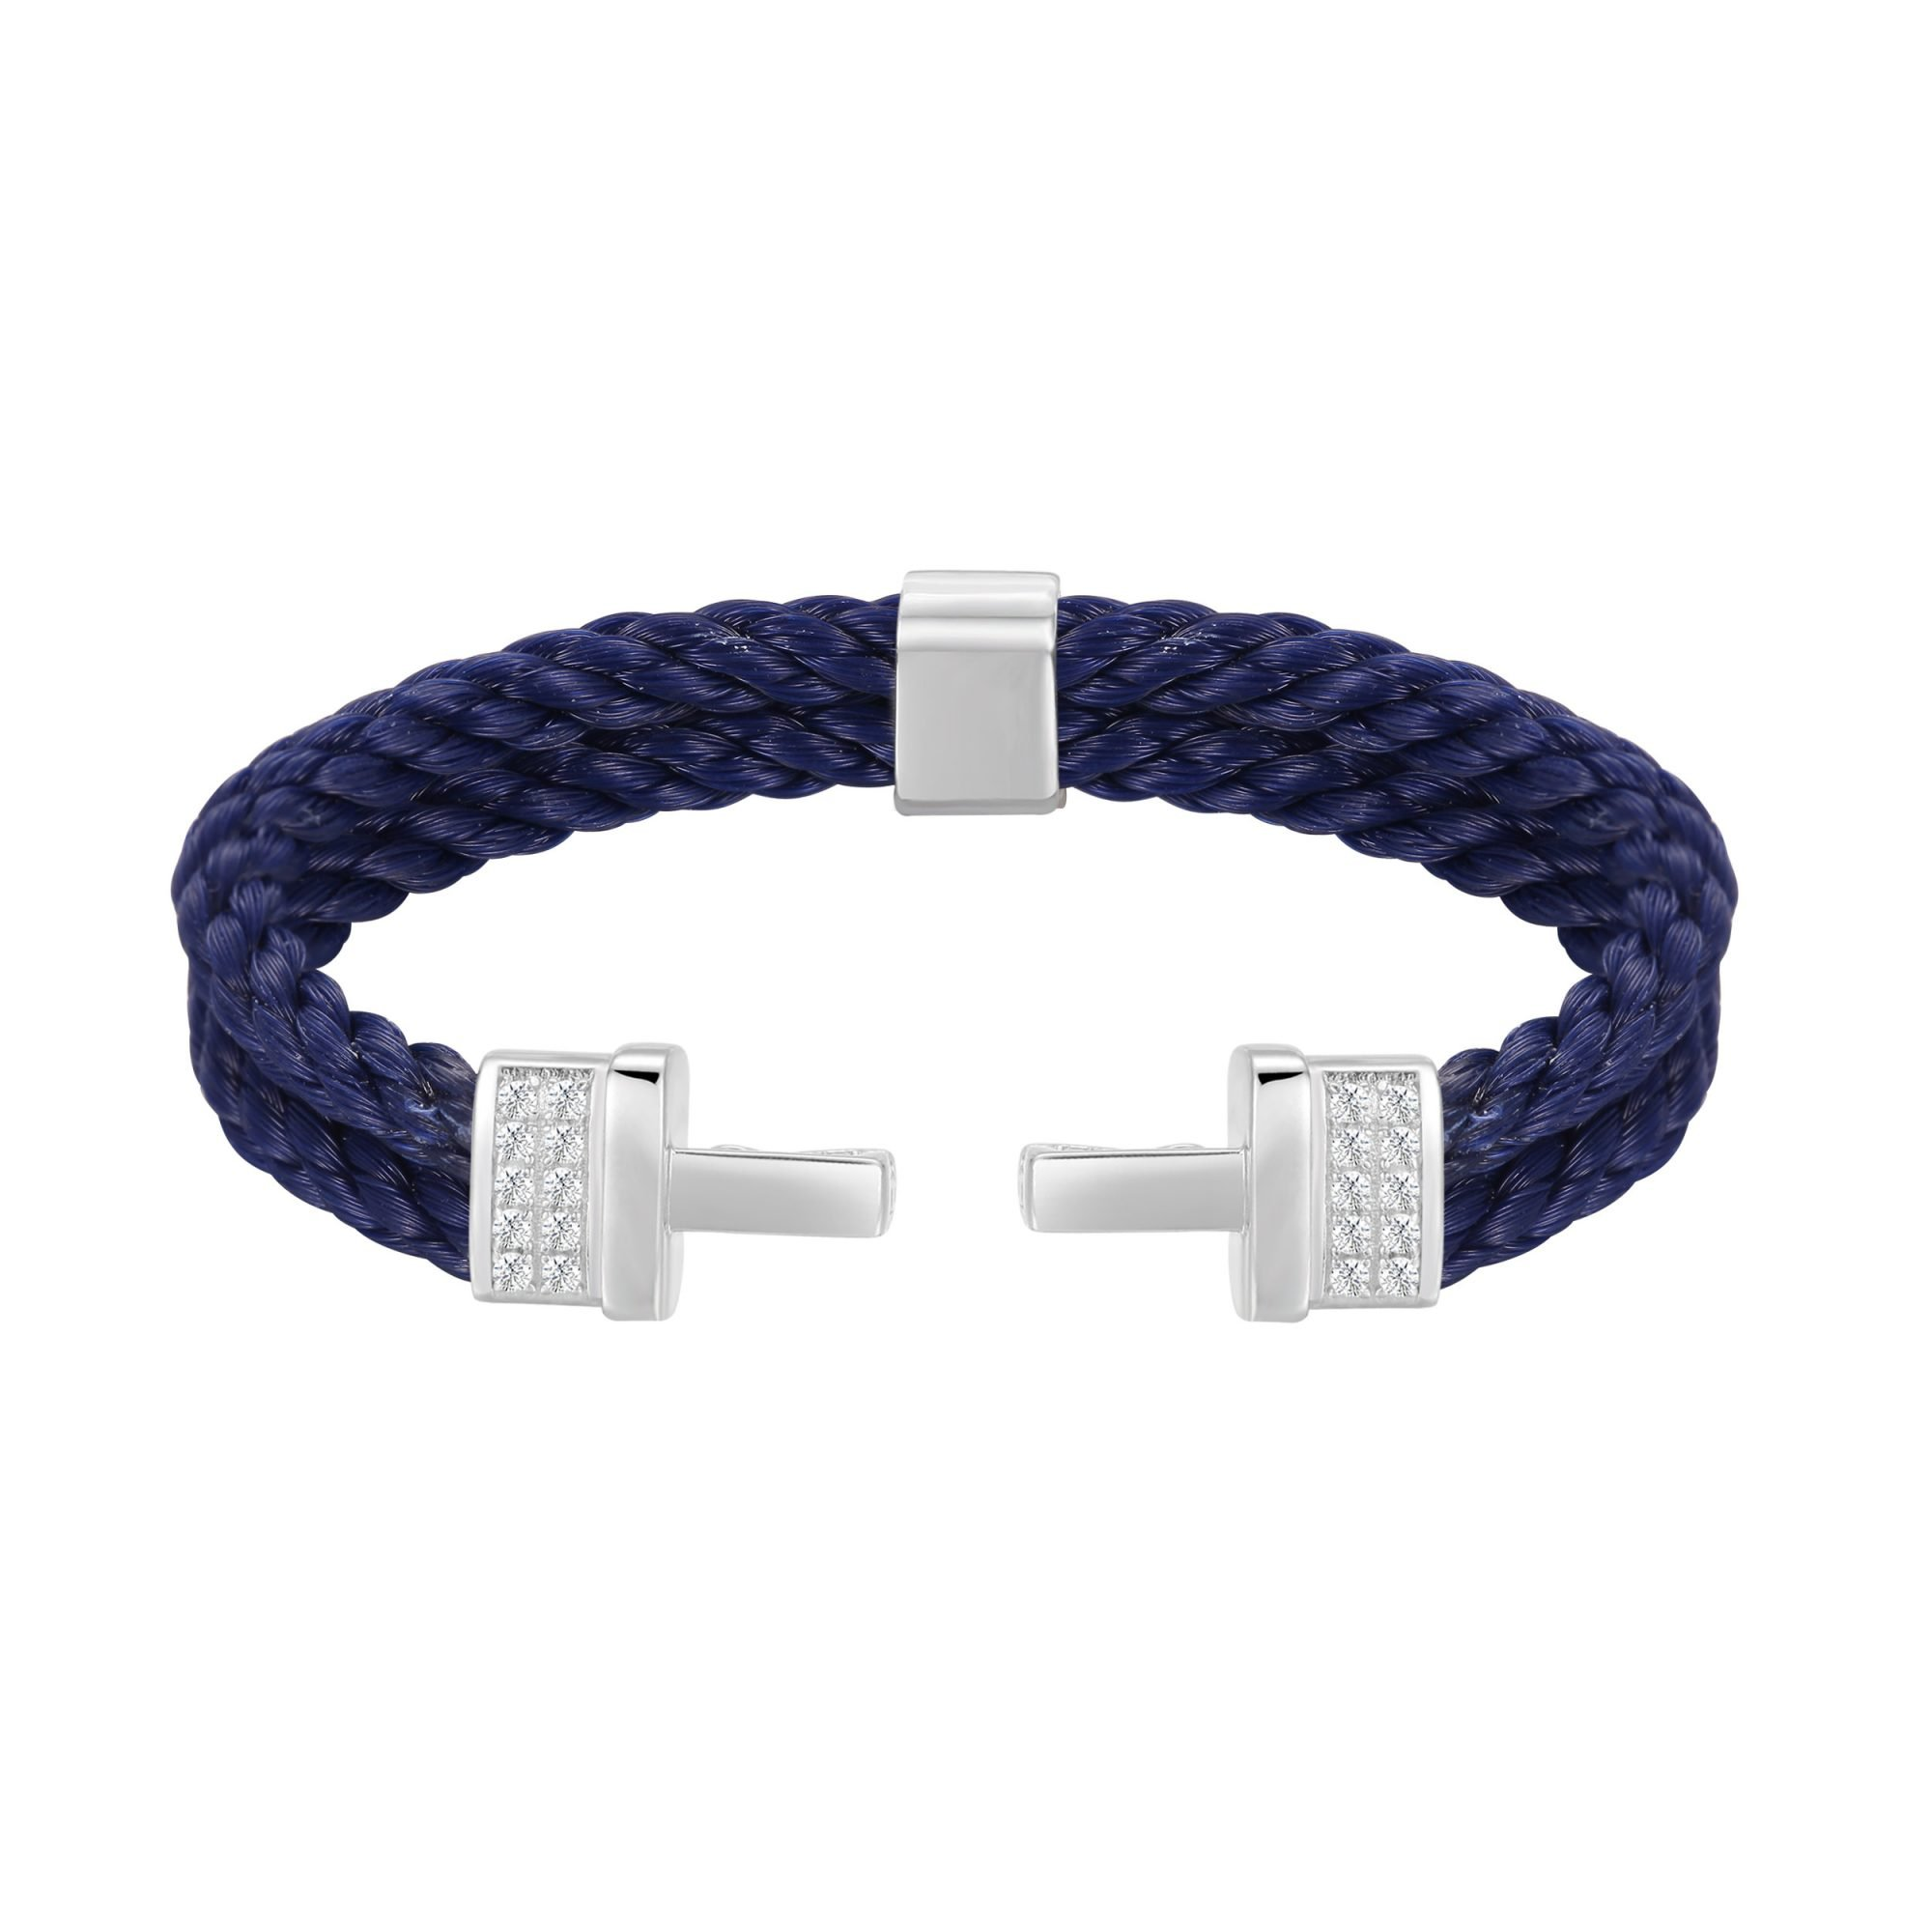 VIKTOR ALEXANDER 925 SILVER P2 DOUBLE LOCK BRACELET NATURAL WHITE SAPPHIRE SILICON NYLON ROPE NAVY BLUE MAIN PROFILE